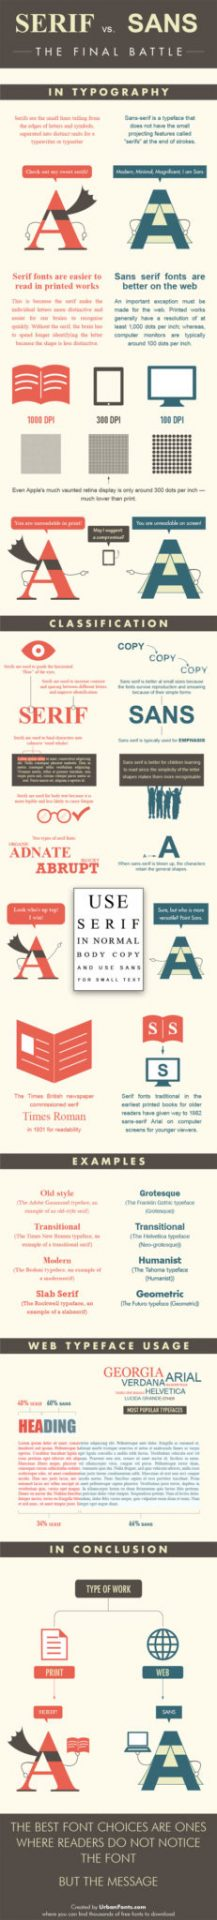 Serif or Sans Serif